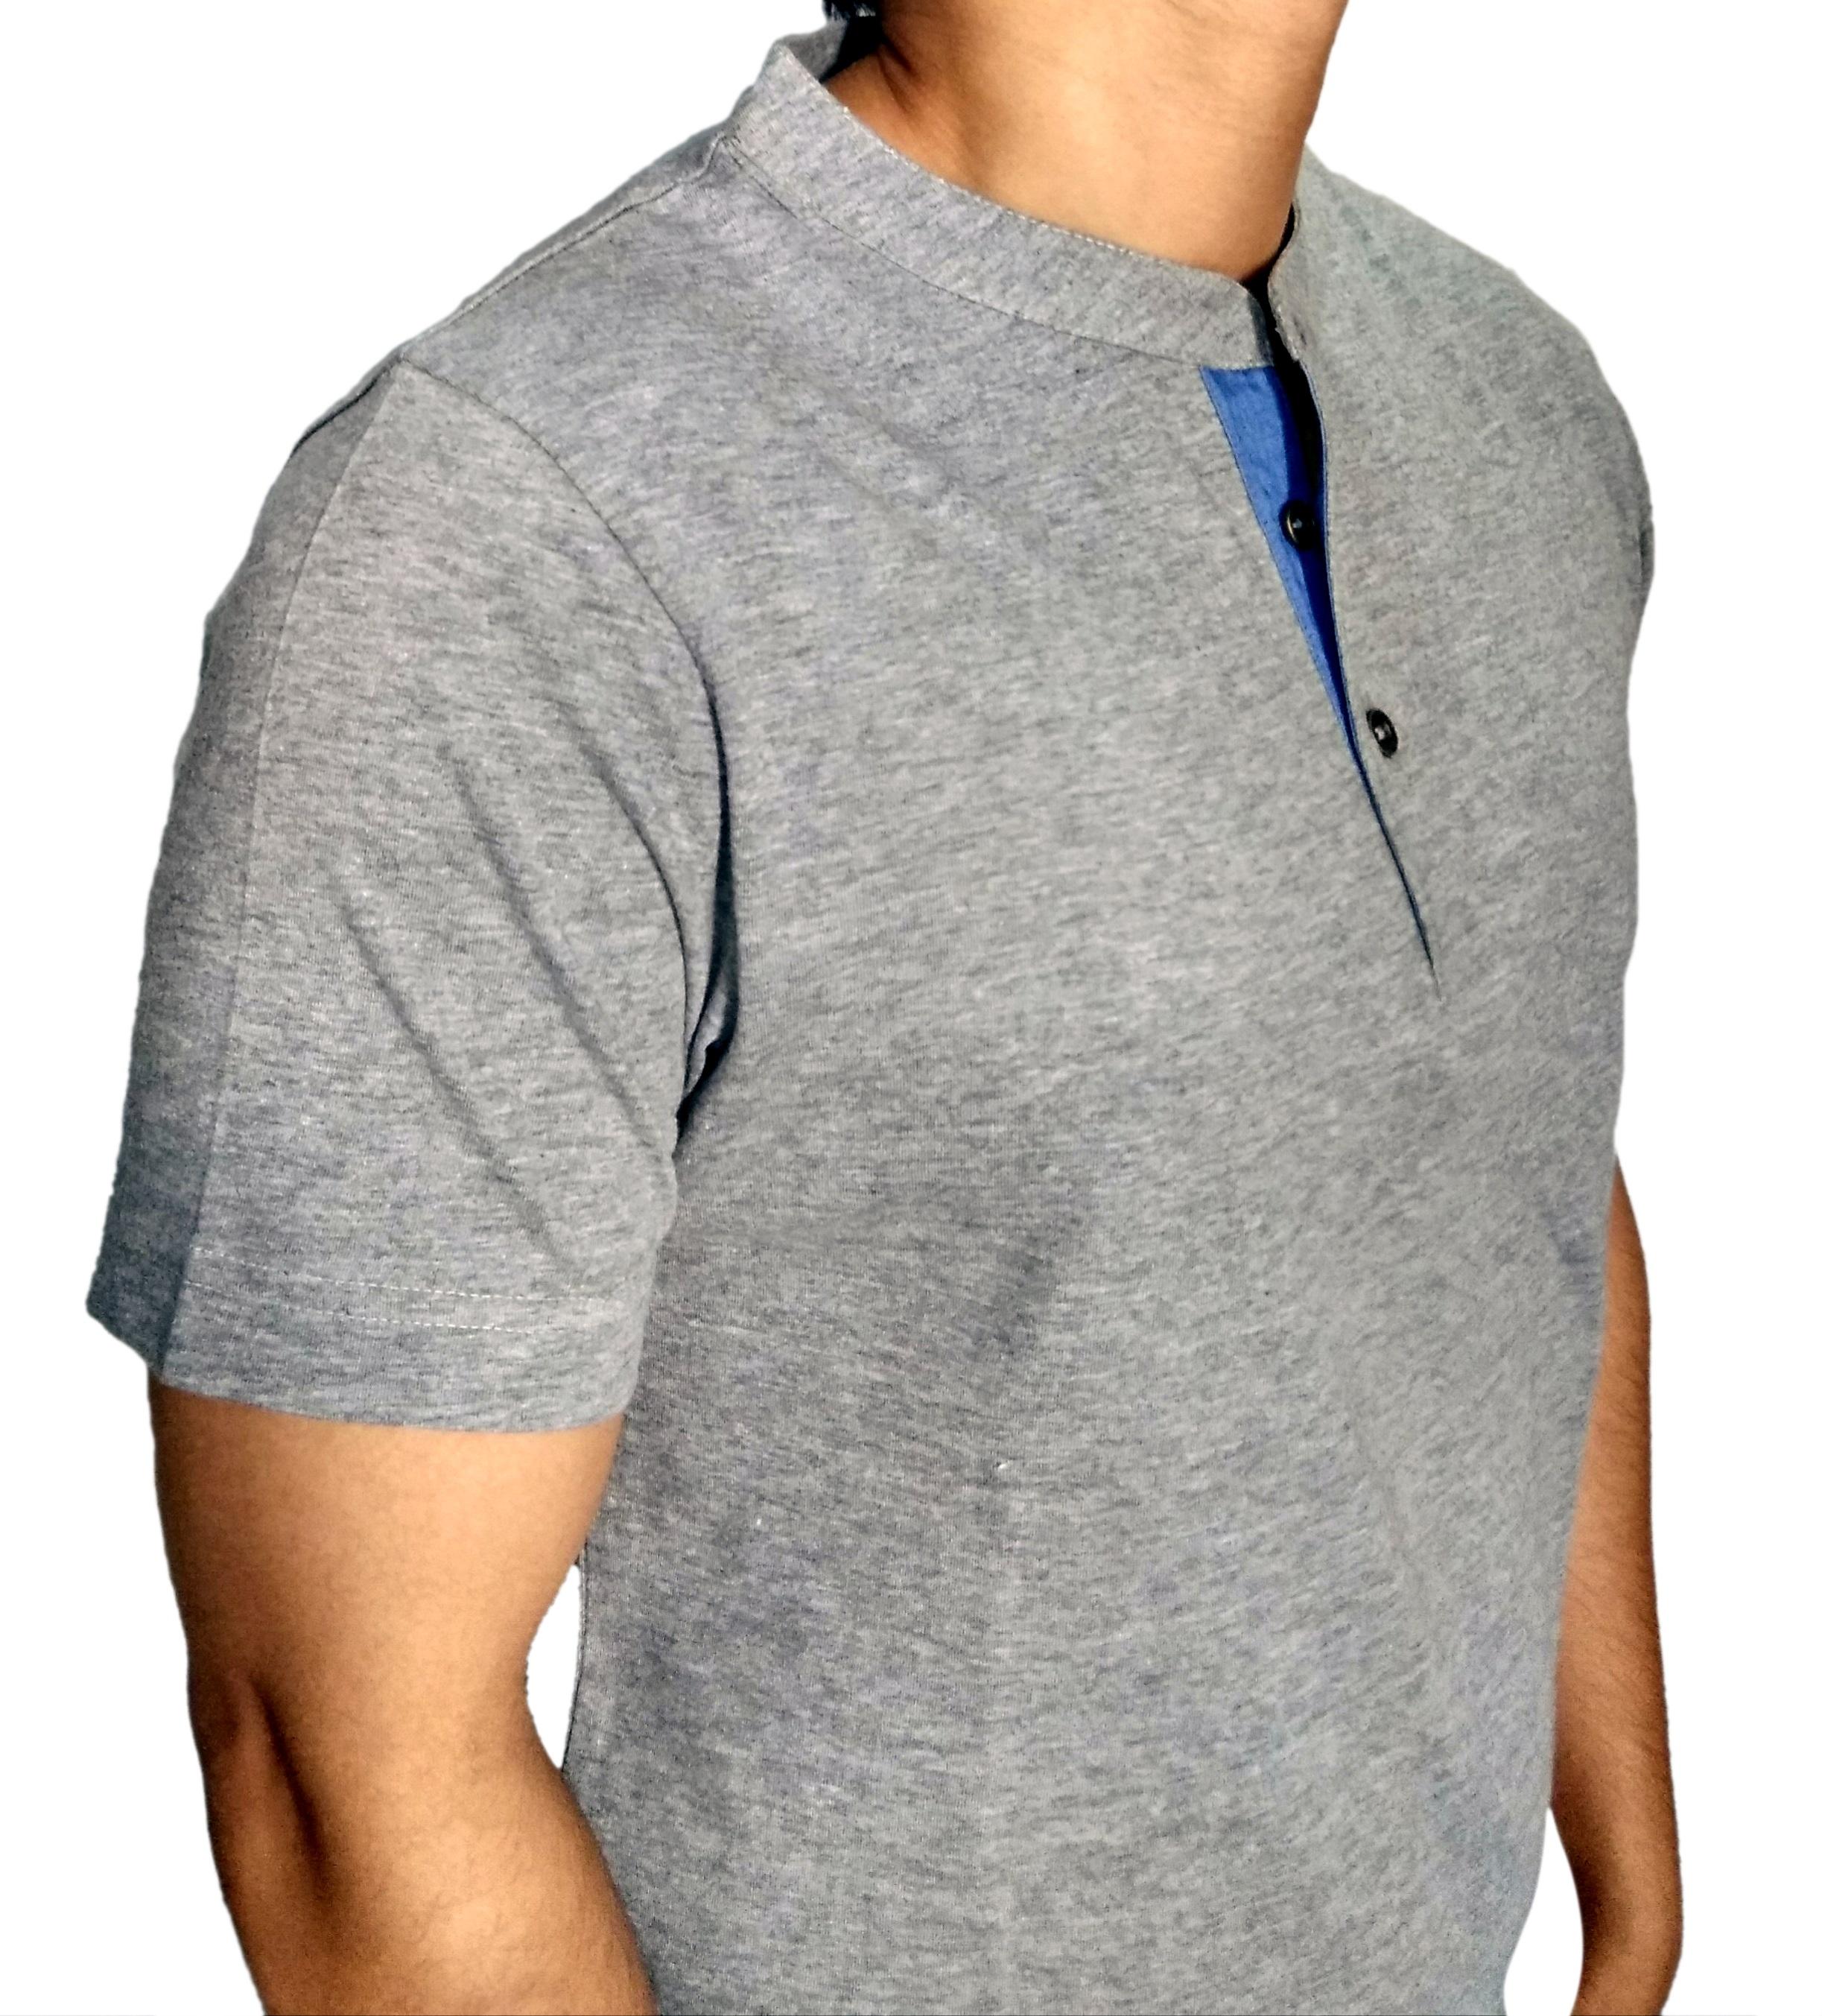 Color swing men grey milange henley t shirt with blue denium moon patch